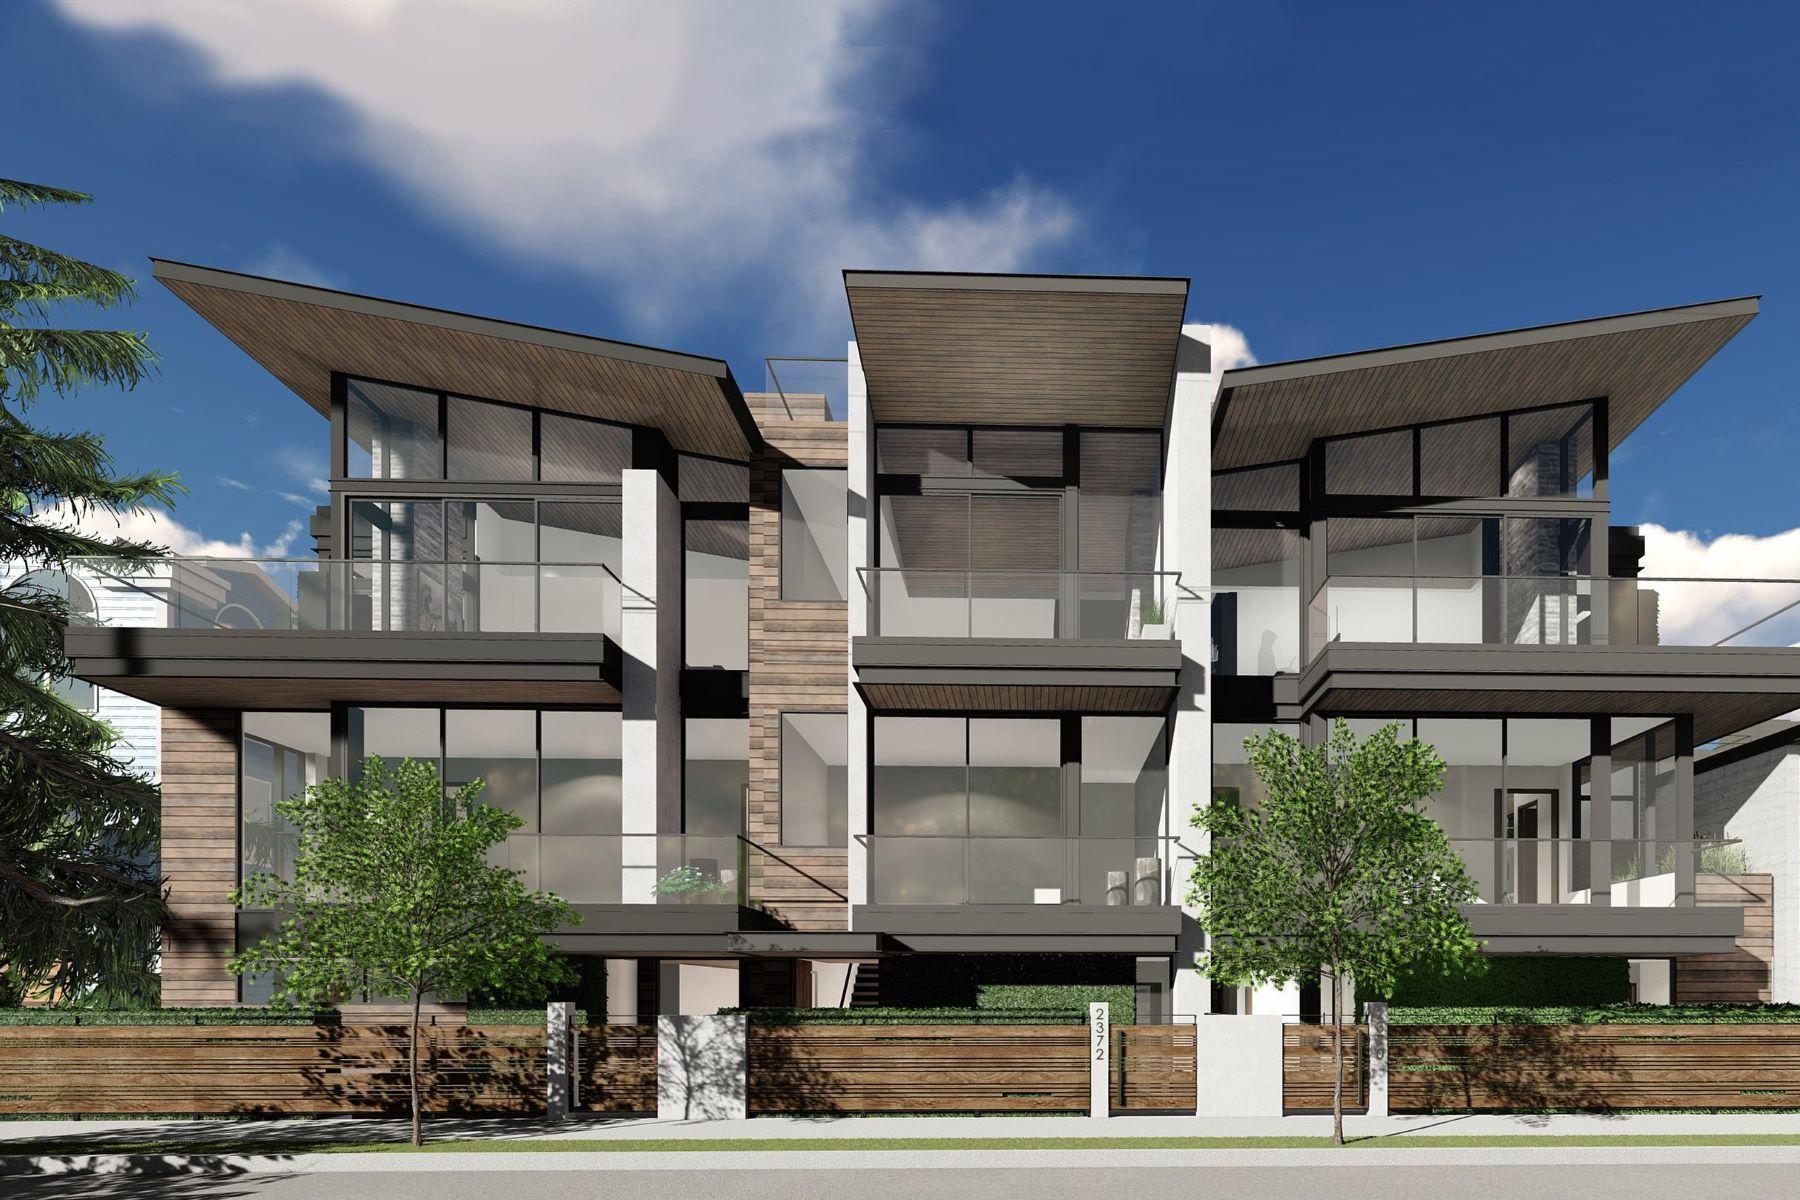 Single Family Homes for Sale at 2370 Fairview Ave E Unit #2, Seattle, WA 98102 Seattle, Washington 98102 United States